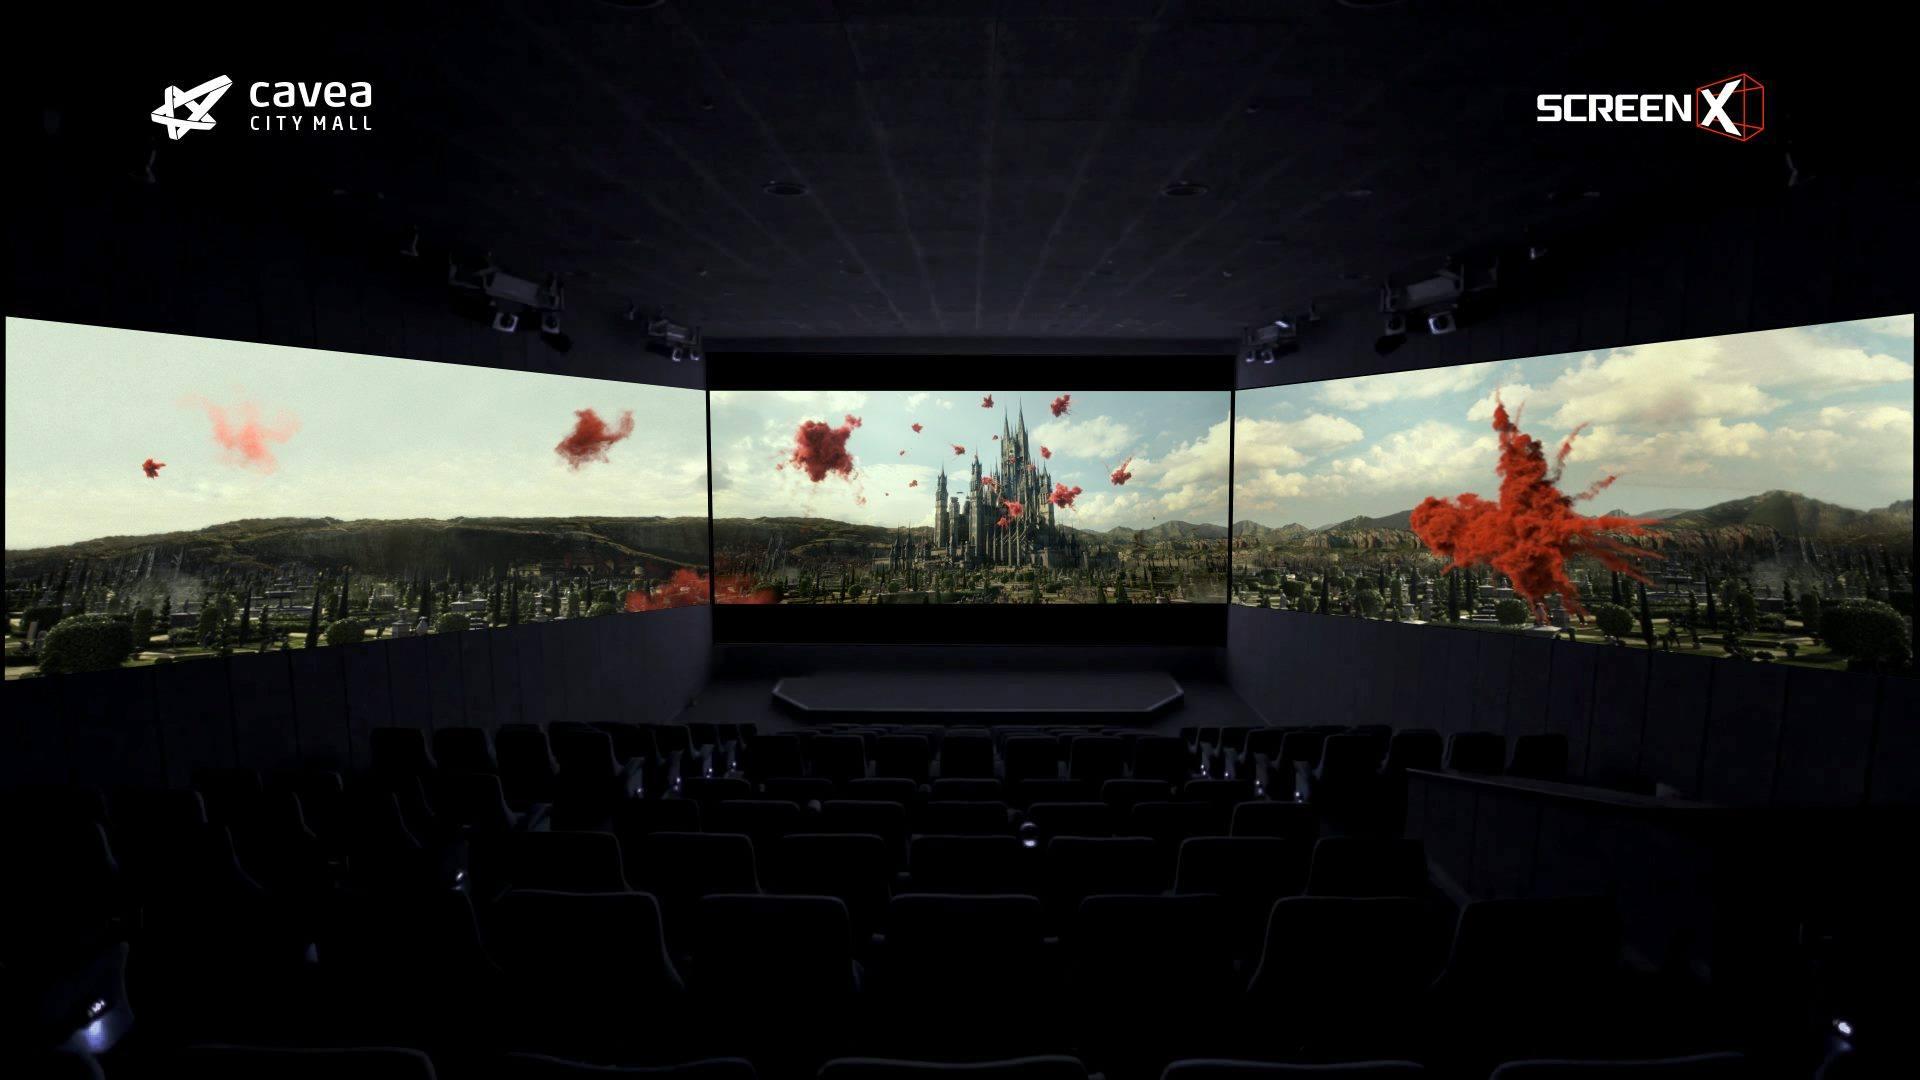 Cavea Cinemas From Georgia Introduces First Ever Screenx Georgia